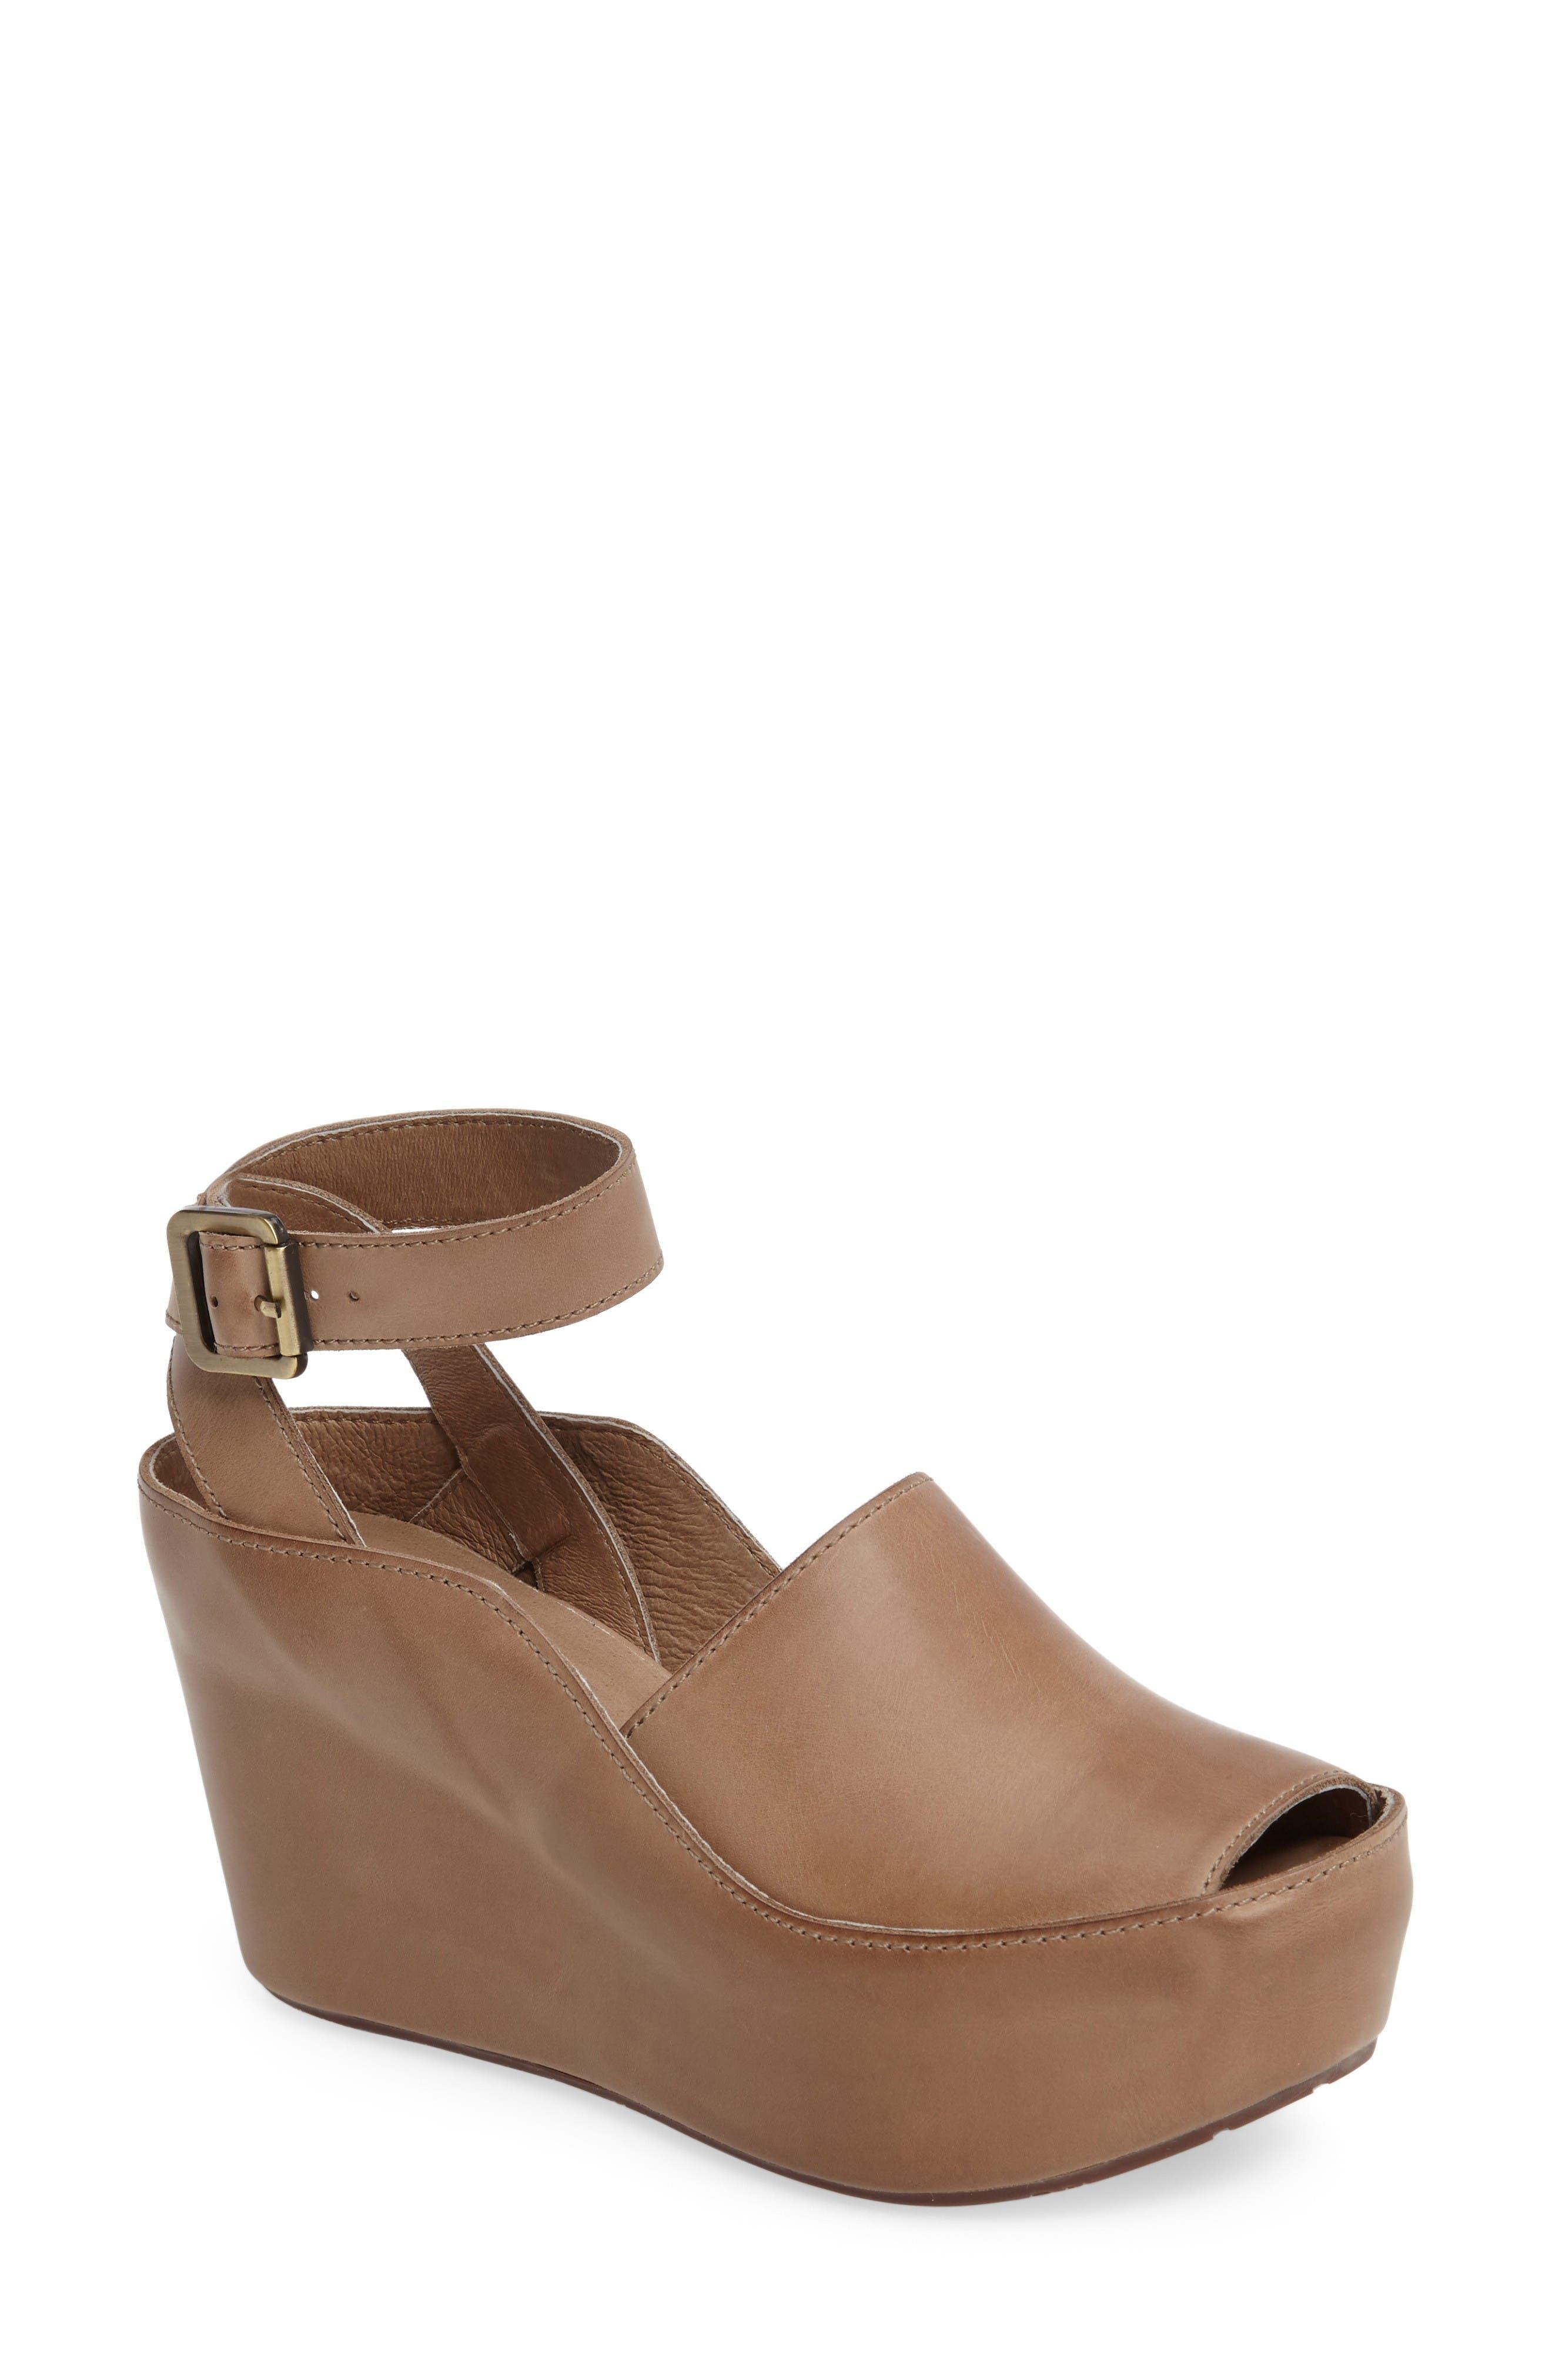 CHOCOLAT BLU Wisper Wedge Sandal